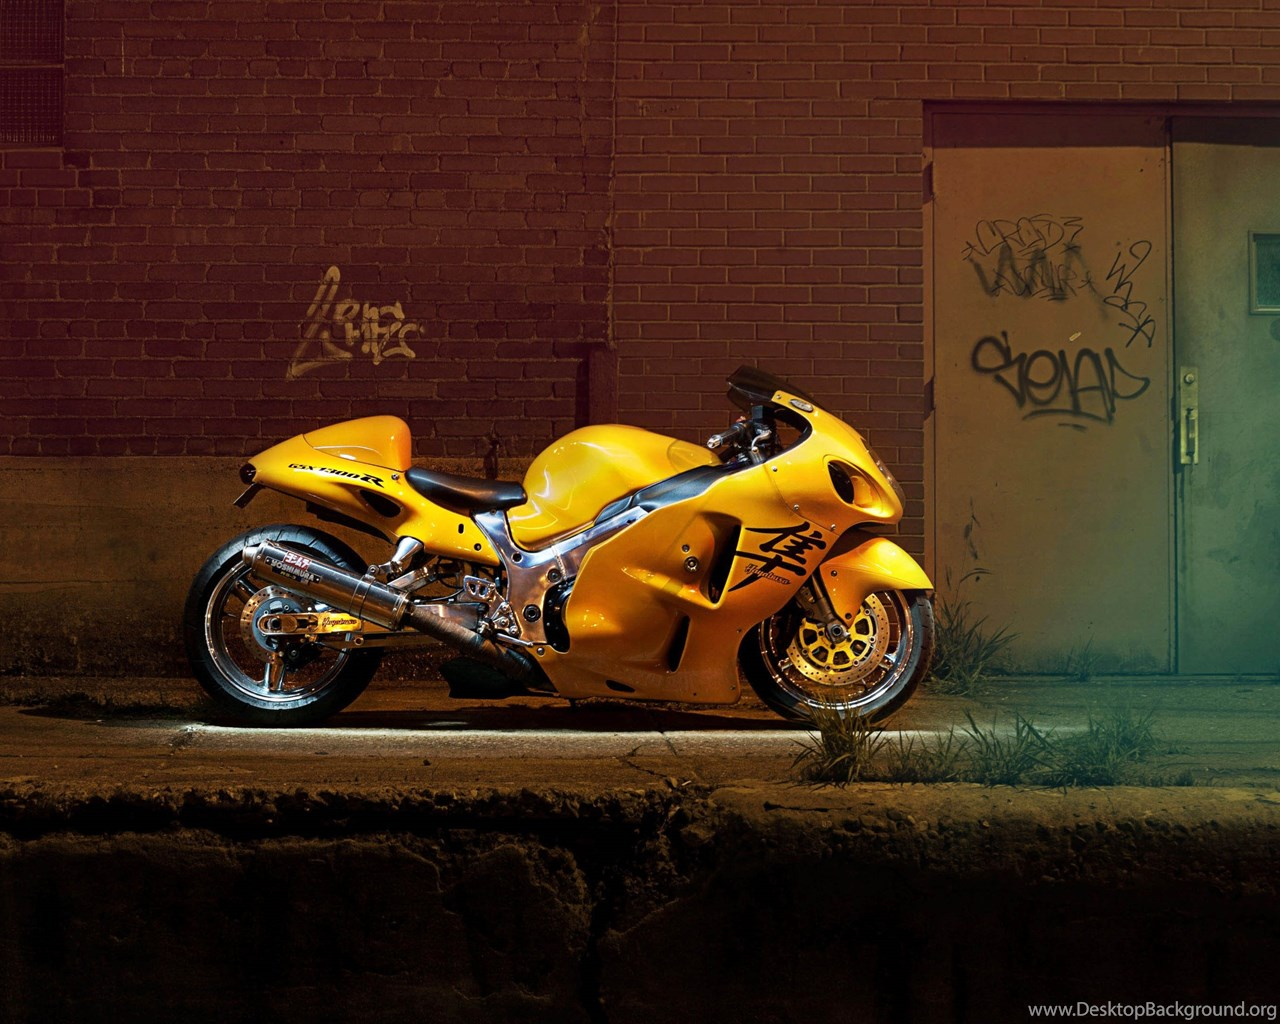 Yellow Suzuki Hayabusa Ready For Street Racing 3840x2160